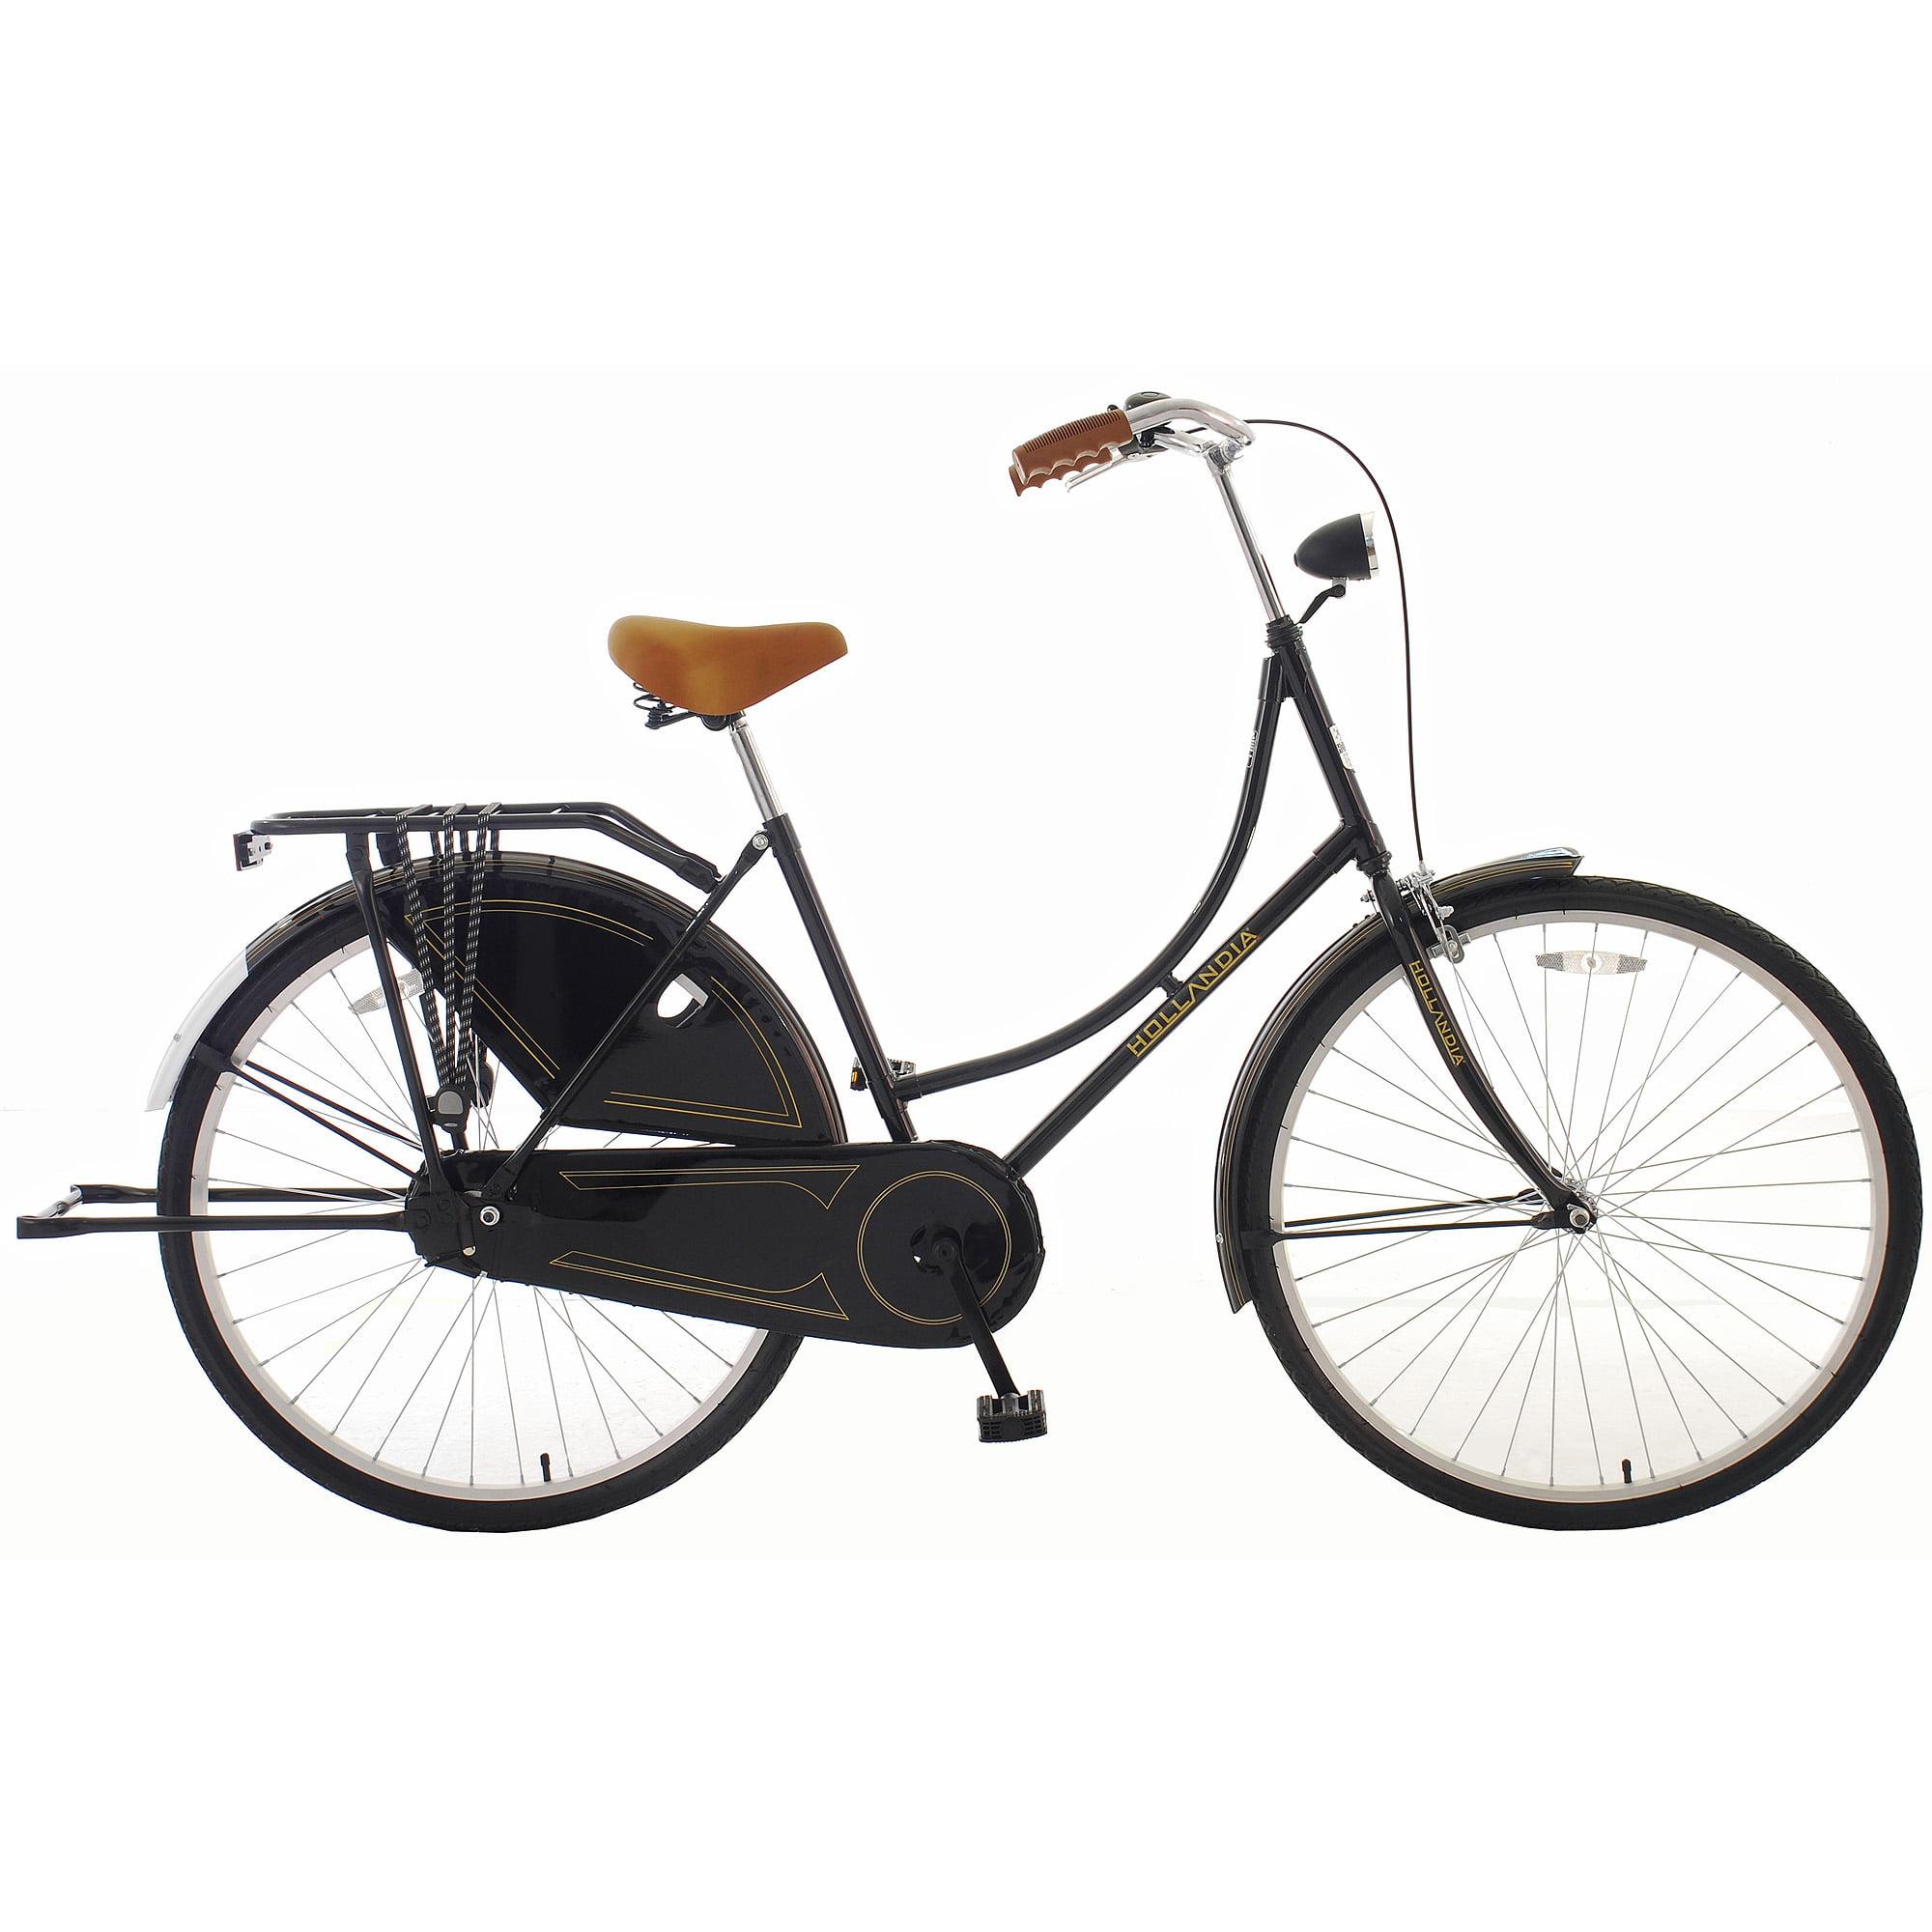 "28"" Hollandia Oma Dutch Cruiser Bicycle"